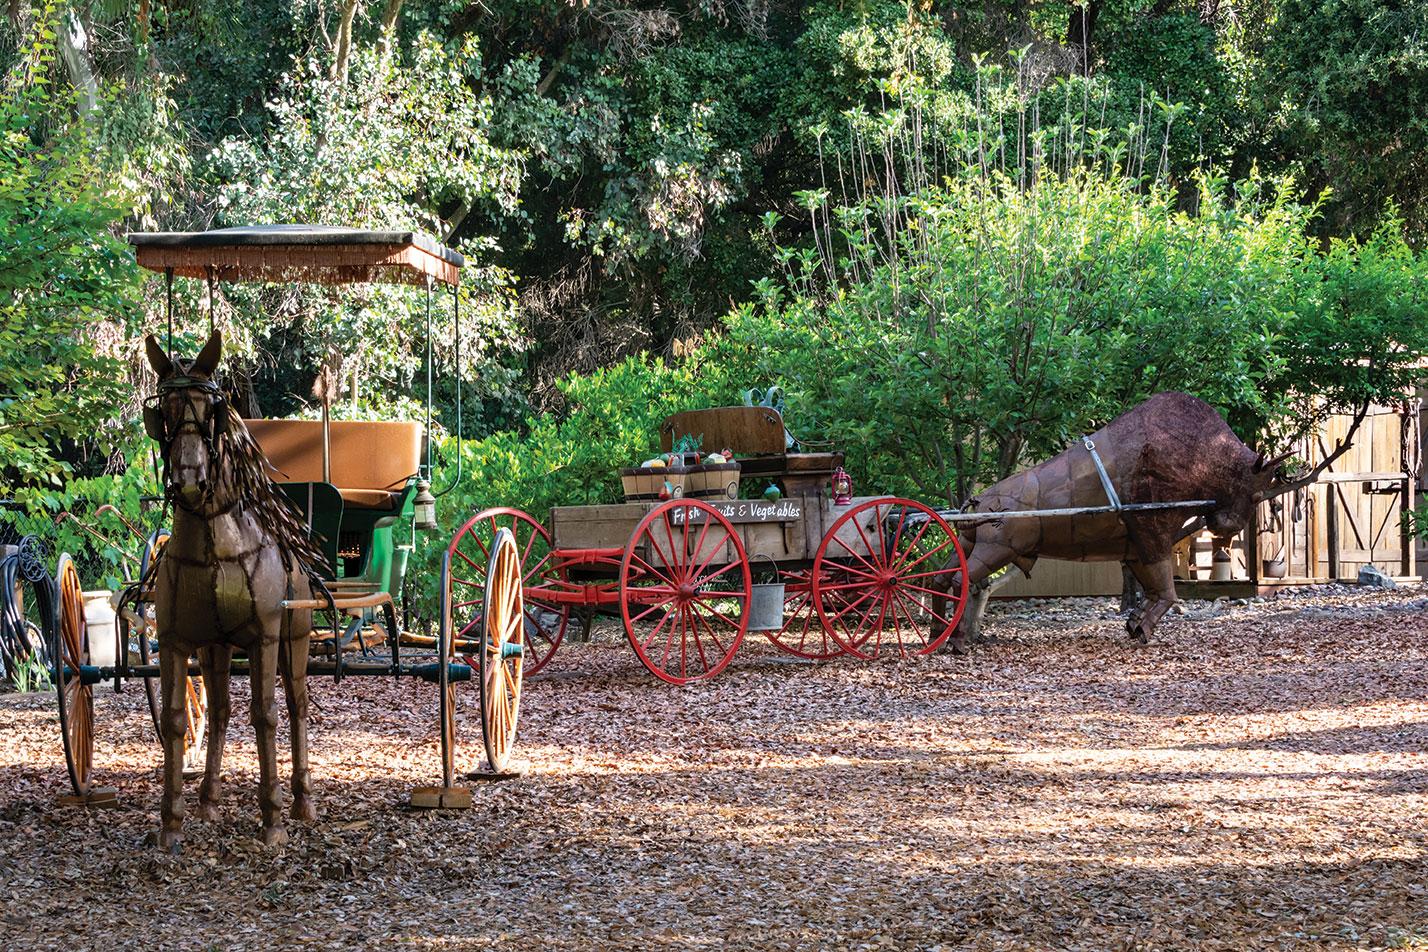 garden motif western wild west mexican sculpture horse buffalo wagon